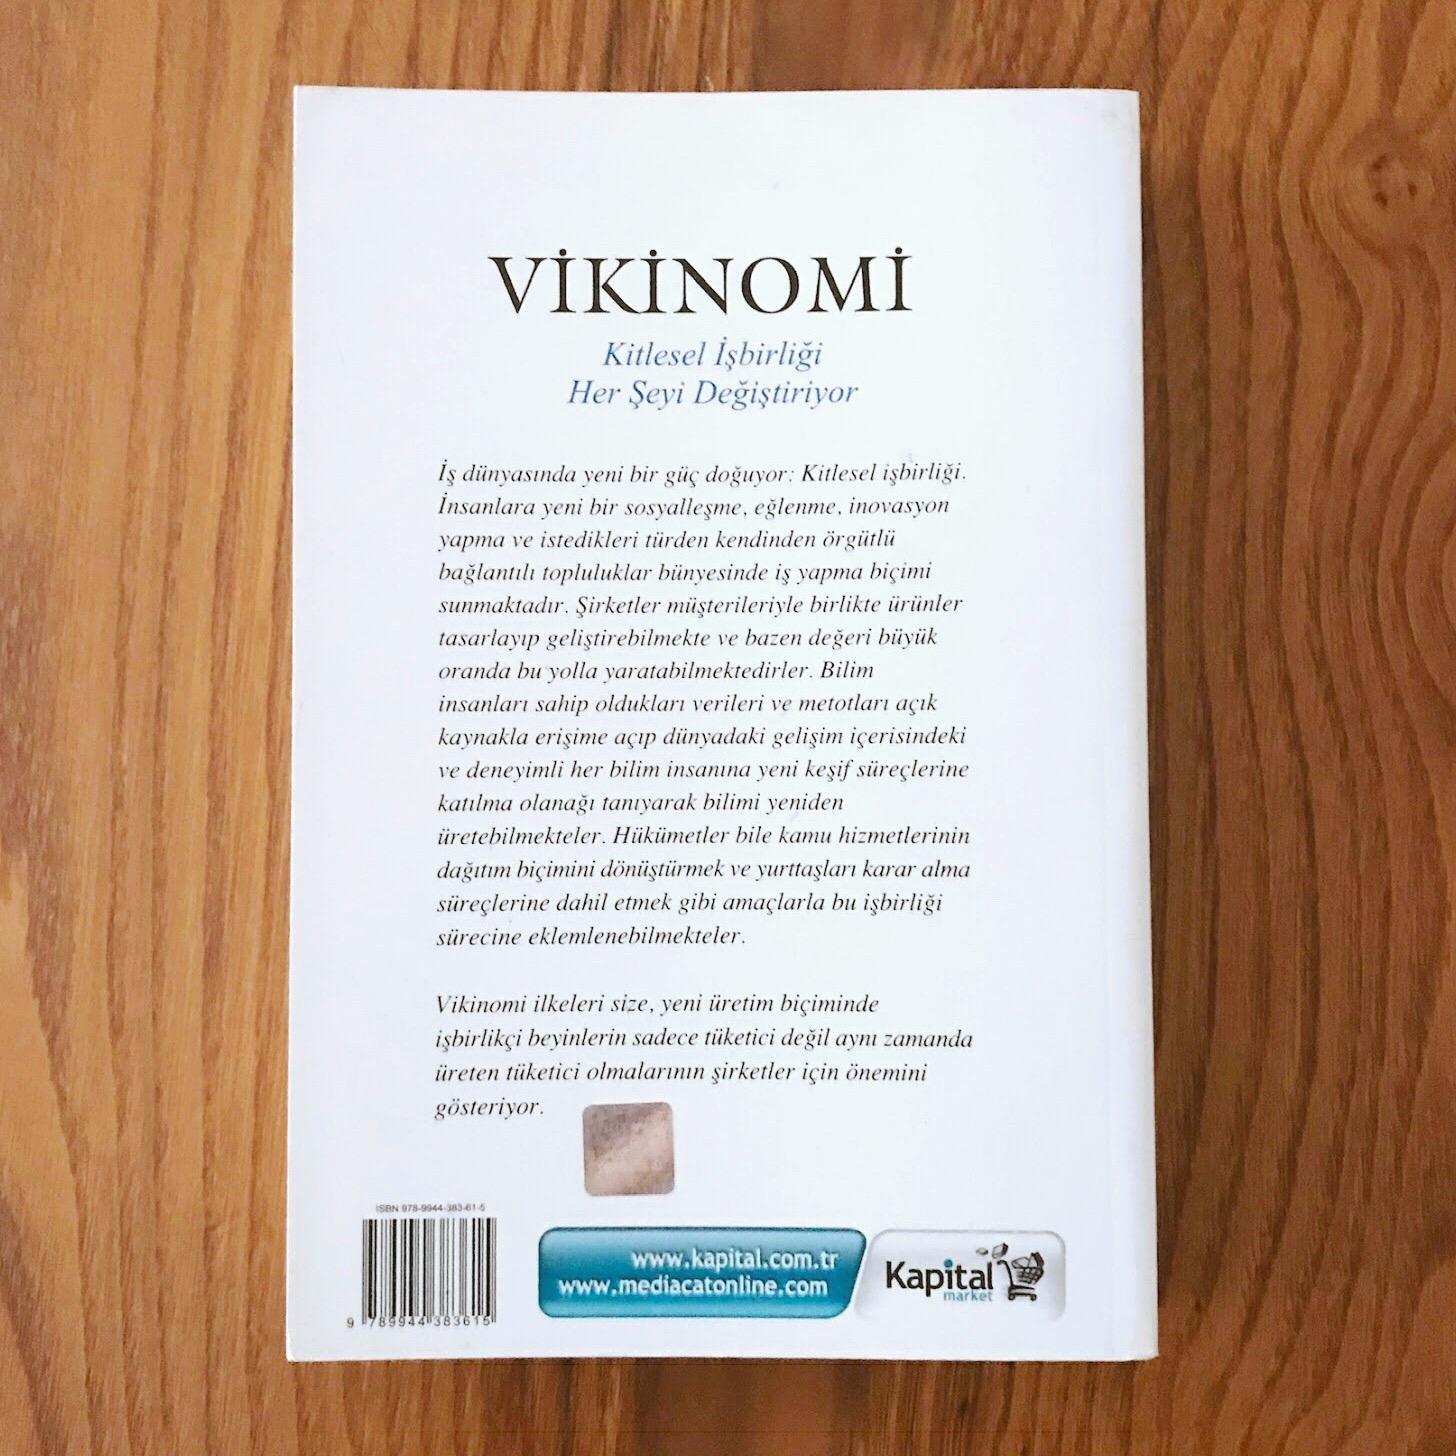 Vikinomi - Kitlesel Isbirligi Her Seyi Degistiriyor (Kitap)